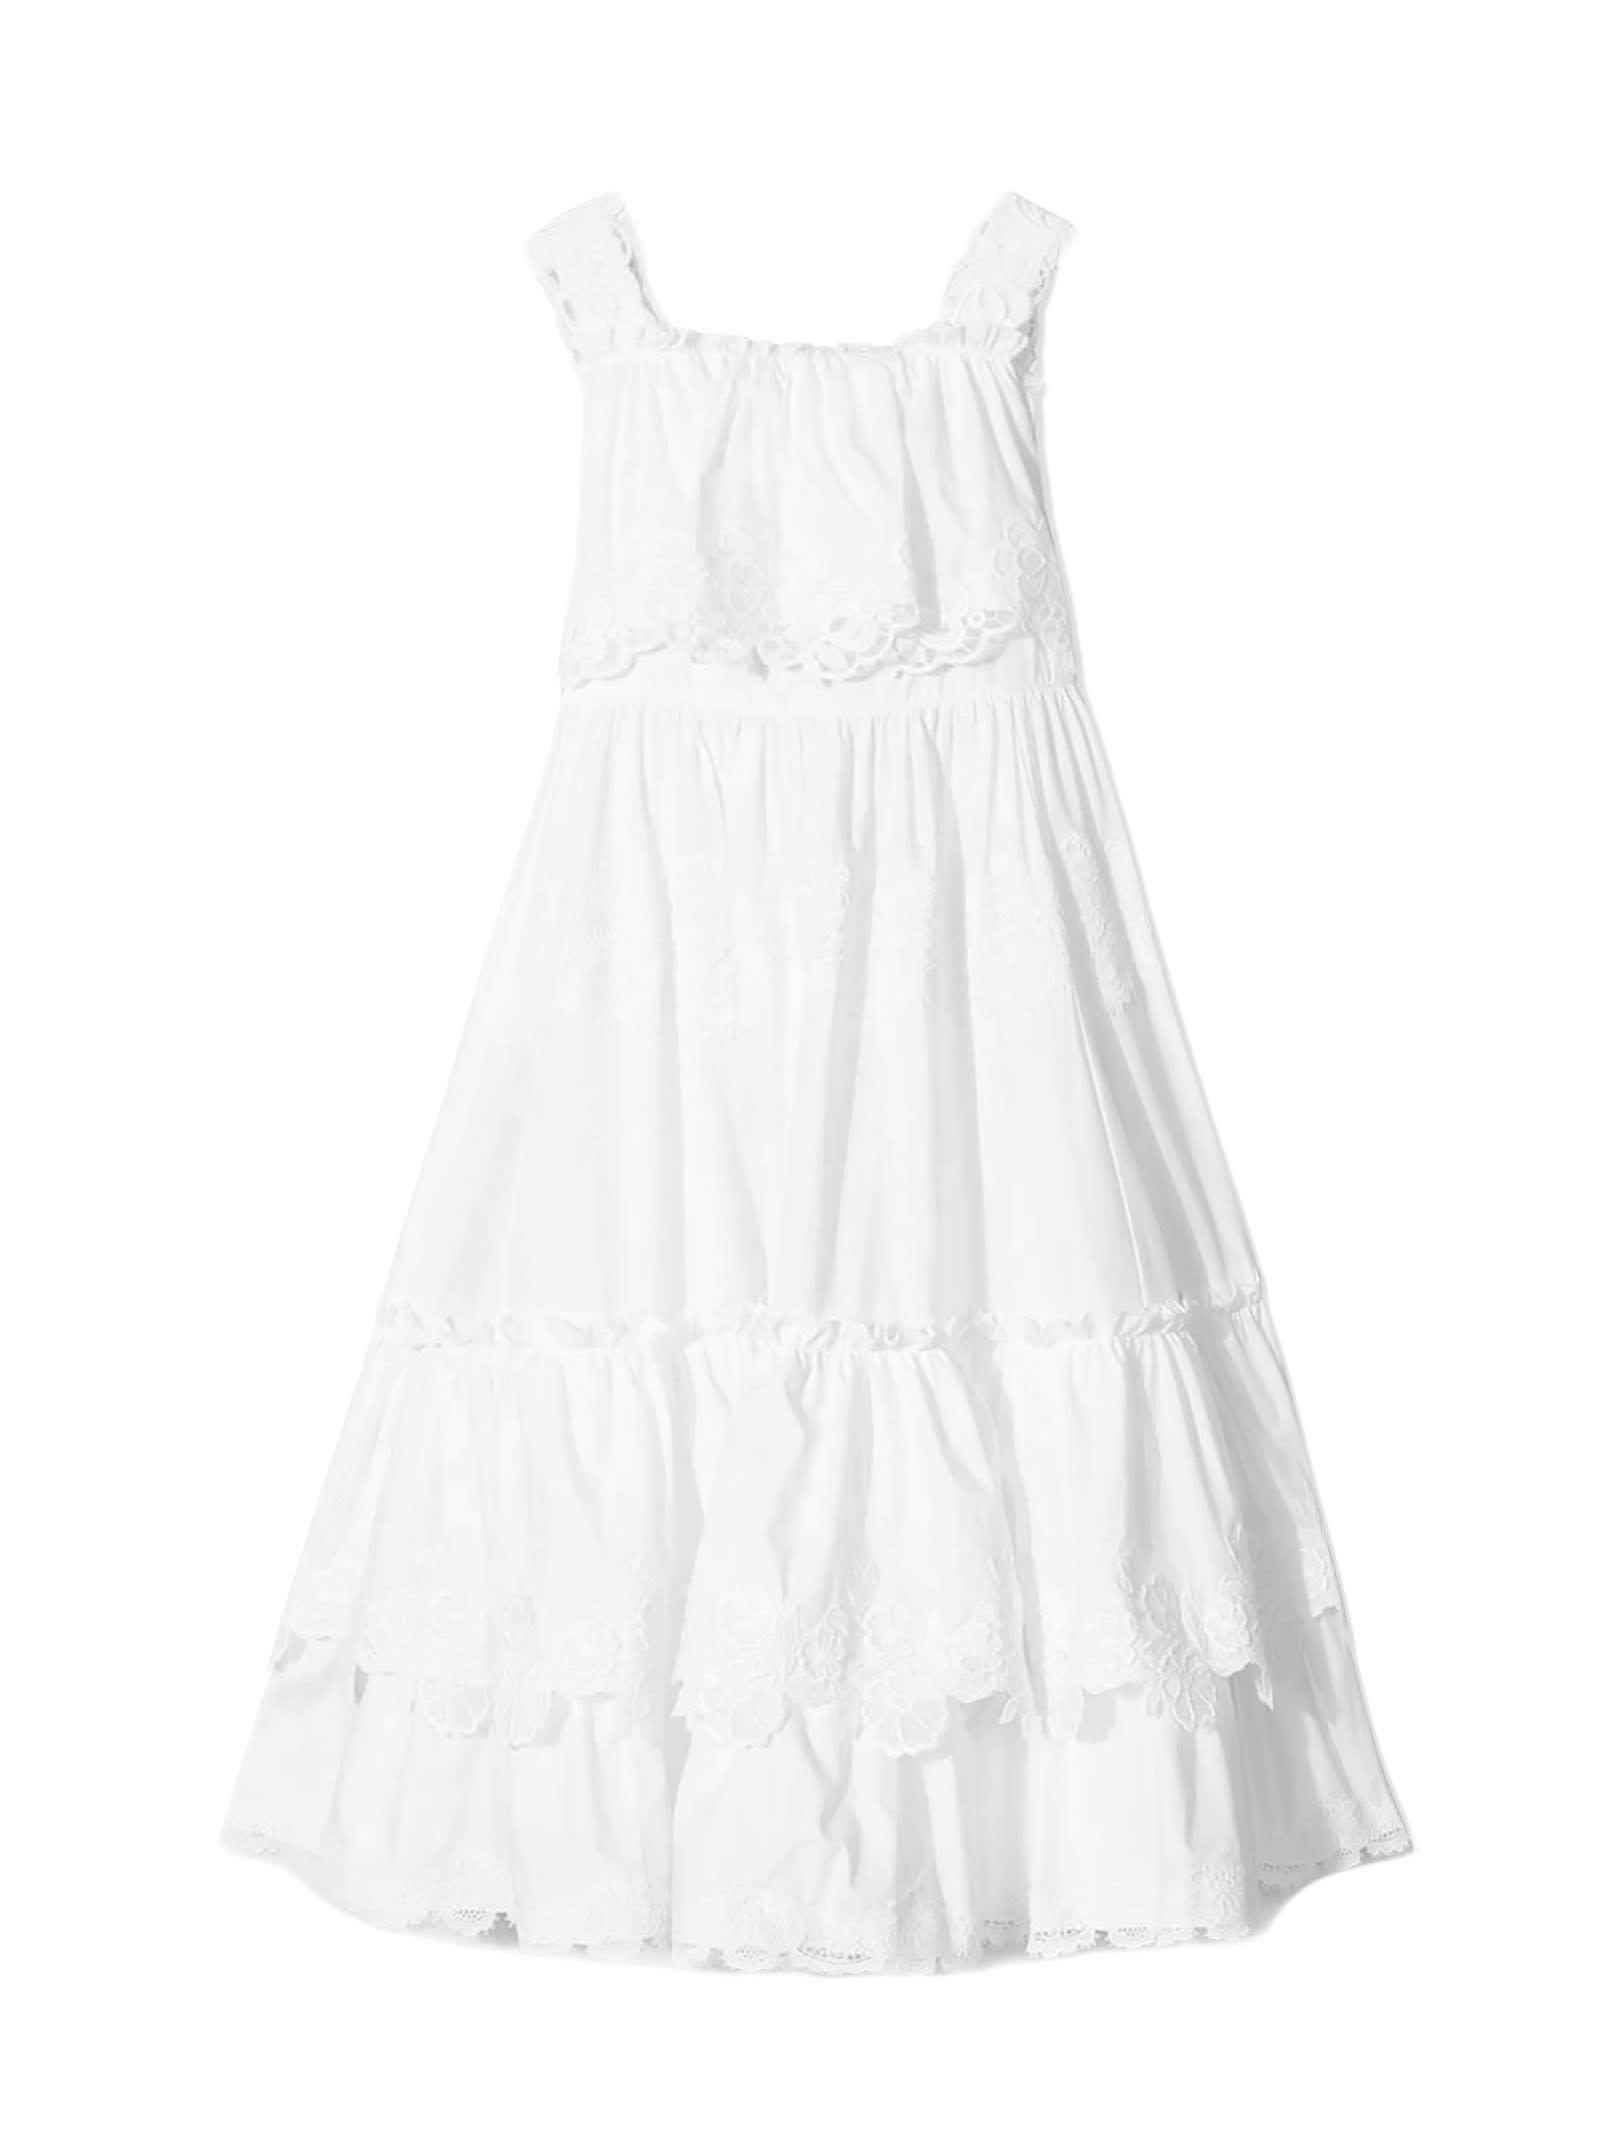 Dolce & Gabbana White Cotton Ruffled Dress